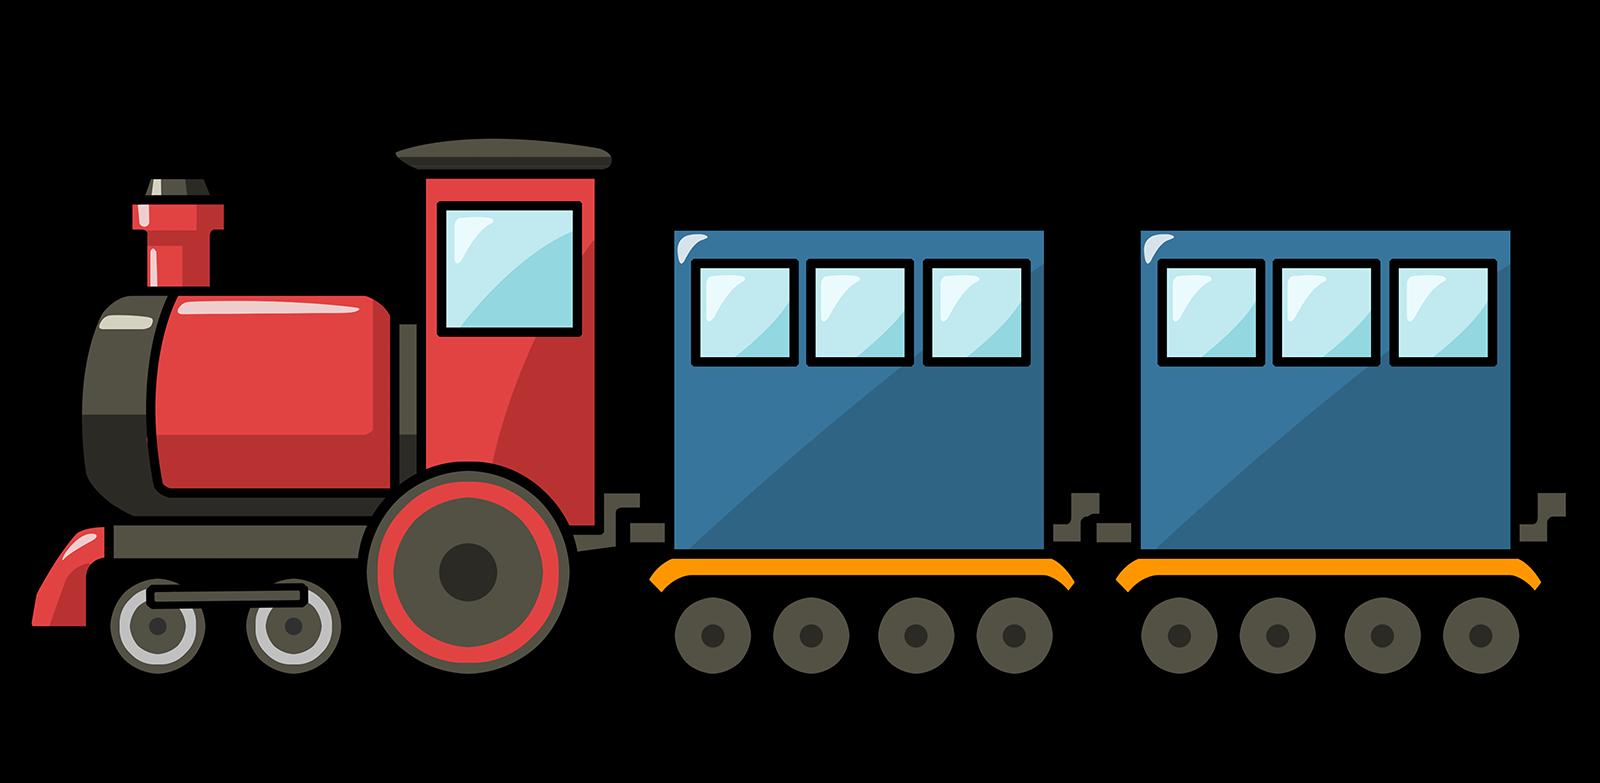 Free Train Cliparts, Download Free Clip Art, Free Clip Art.